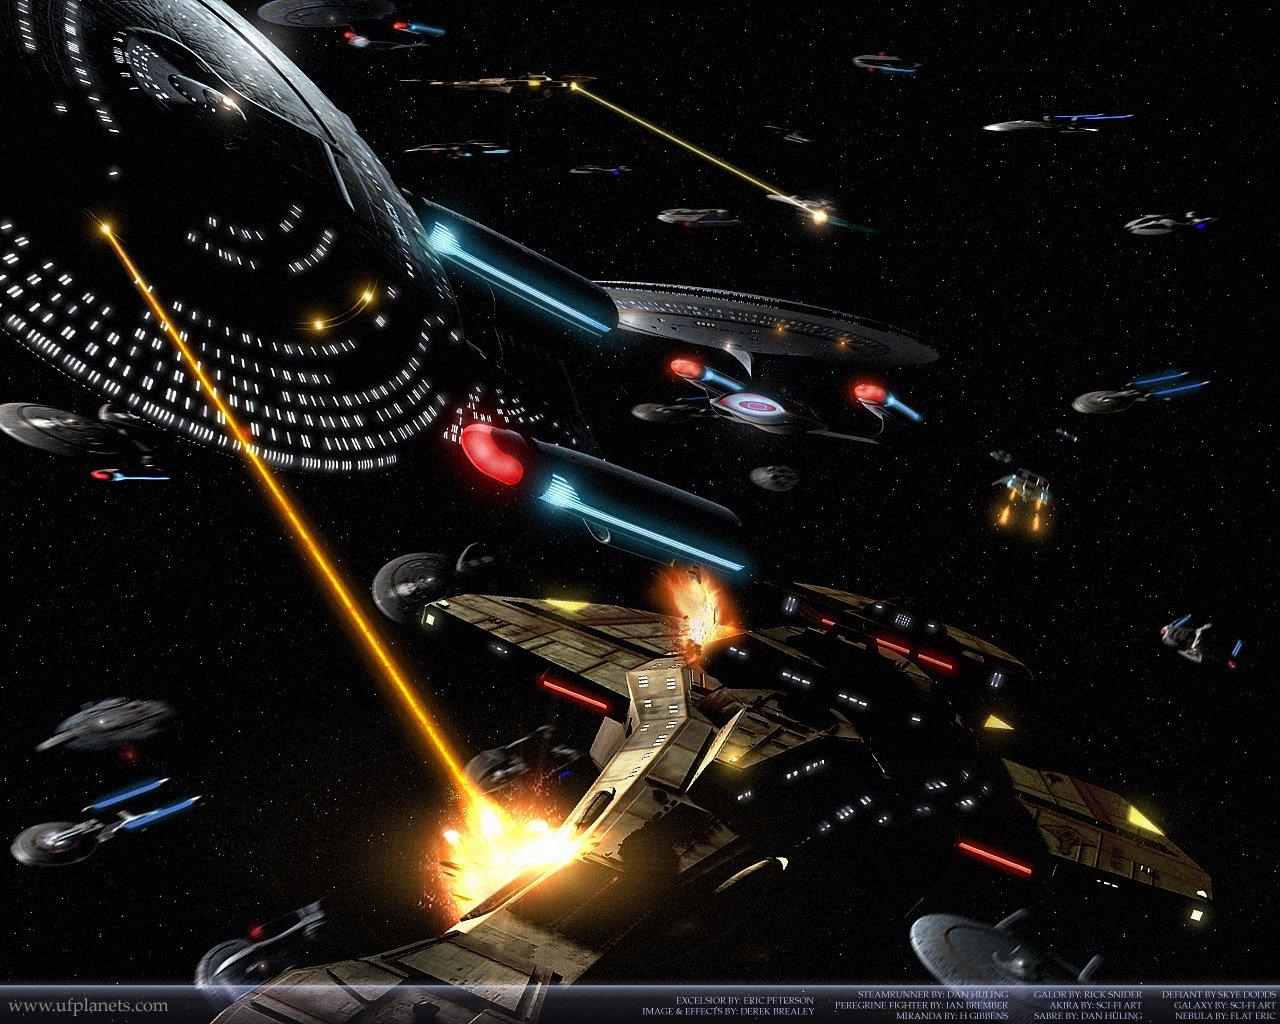 Star Trek HD Wallpaper ImageBankbiz 1280x1024